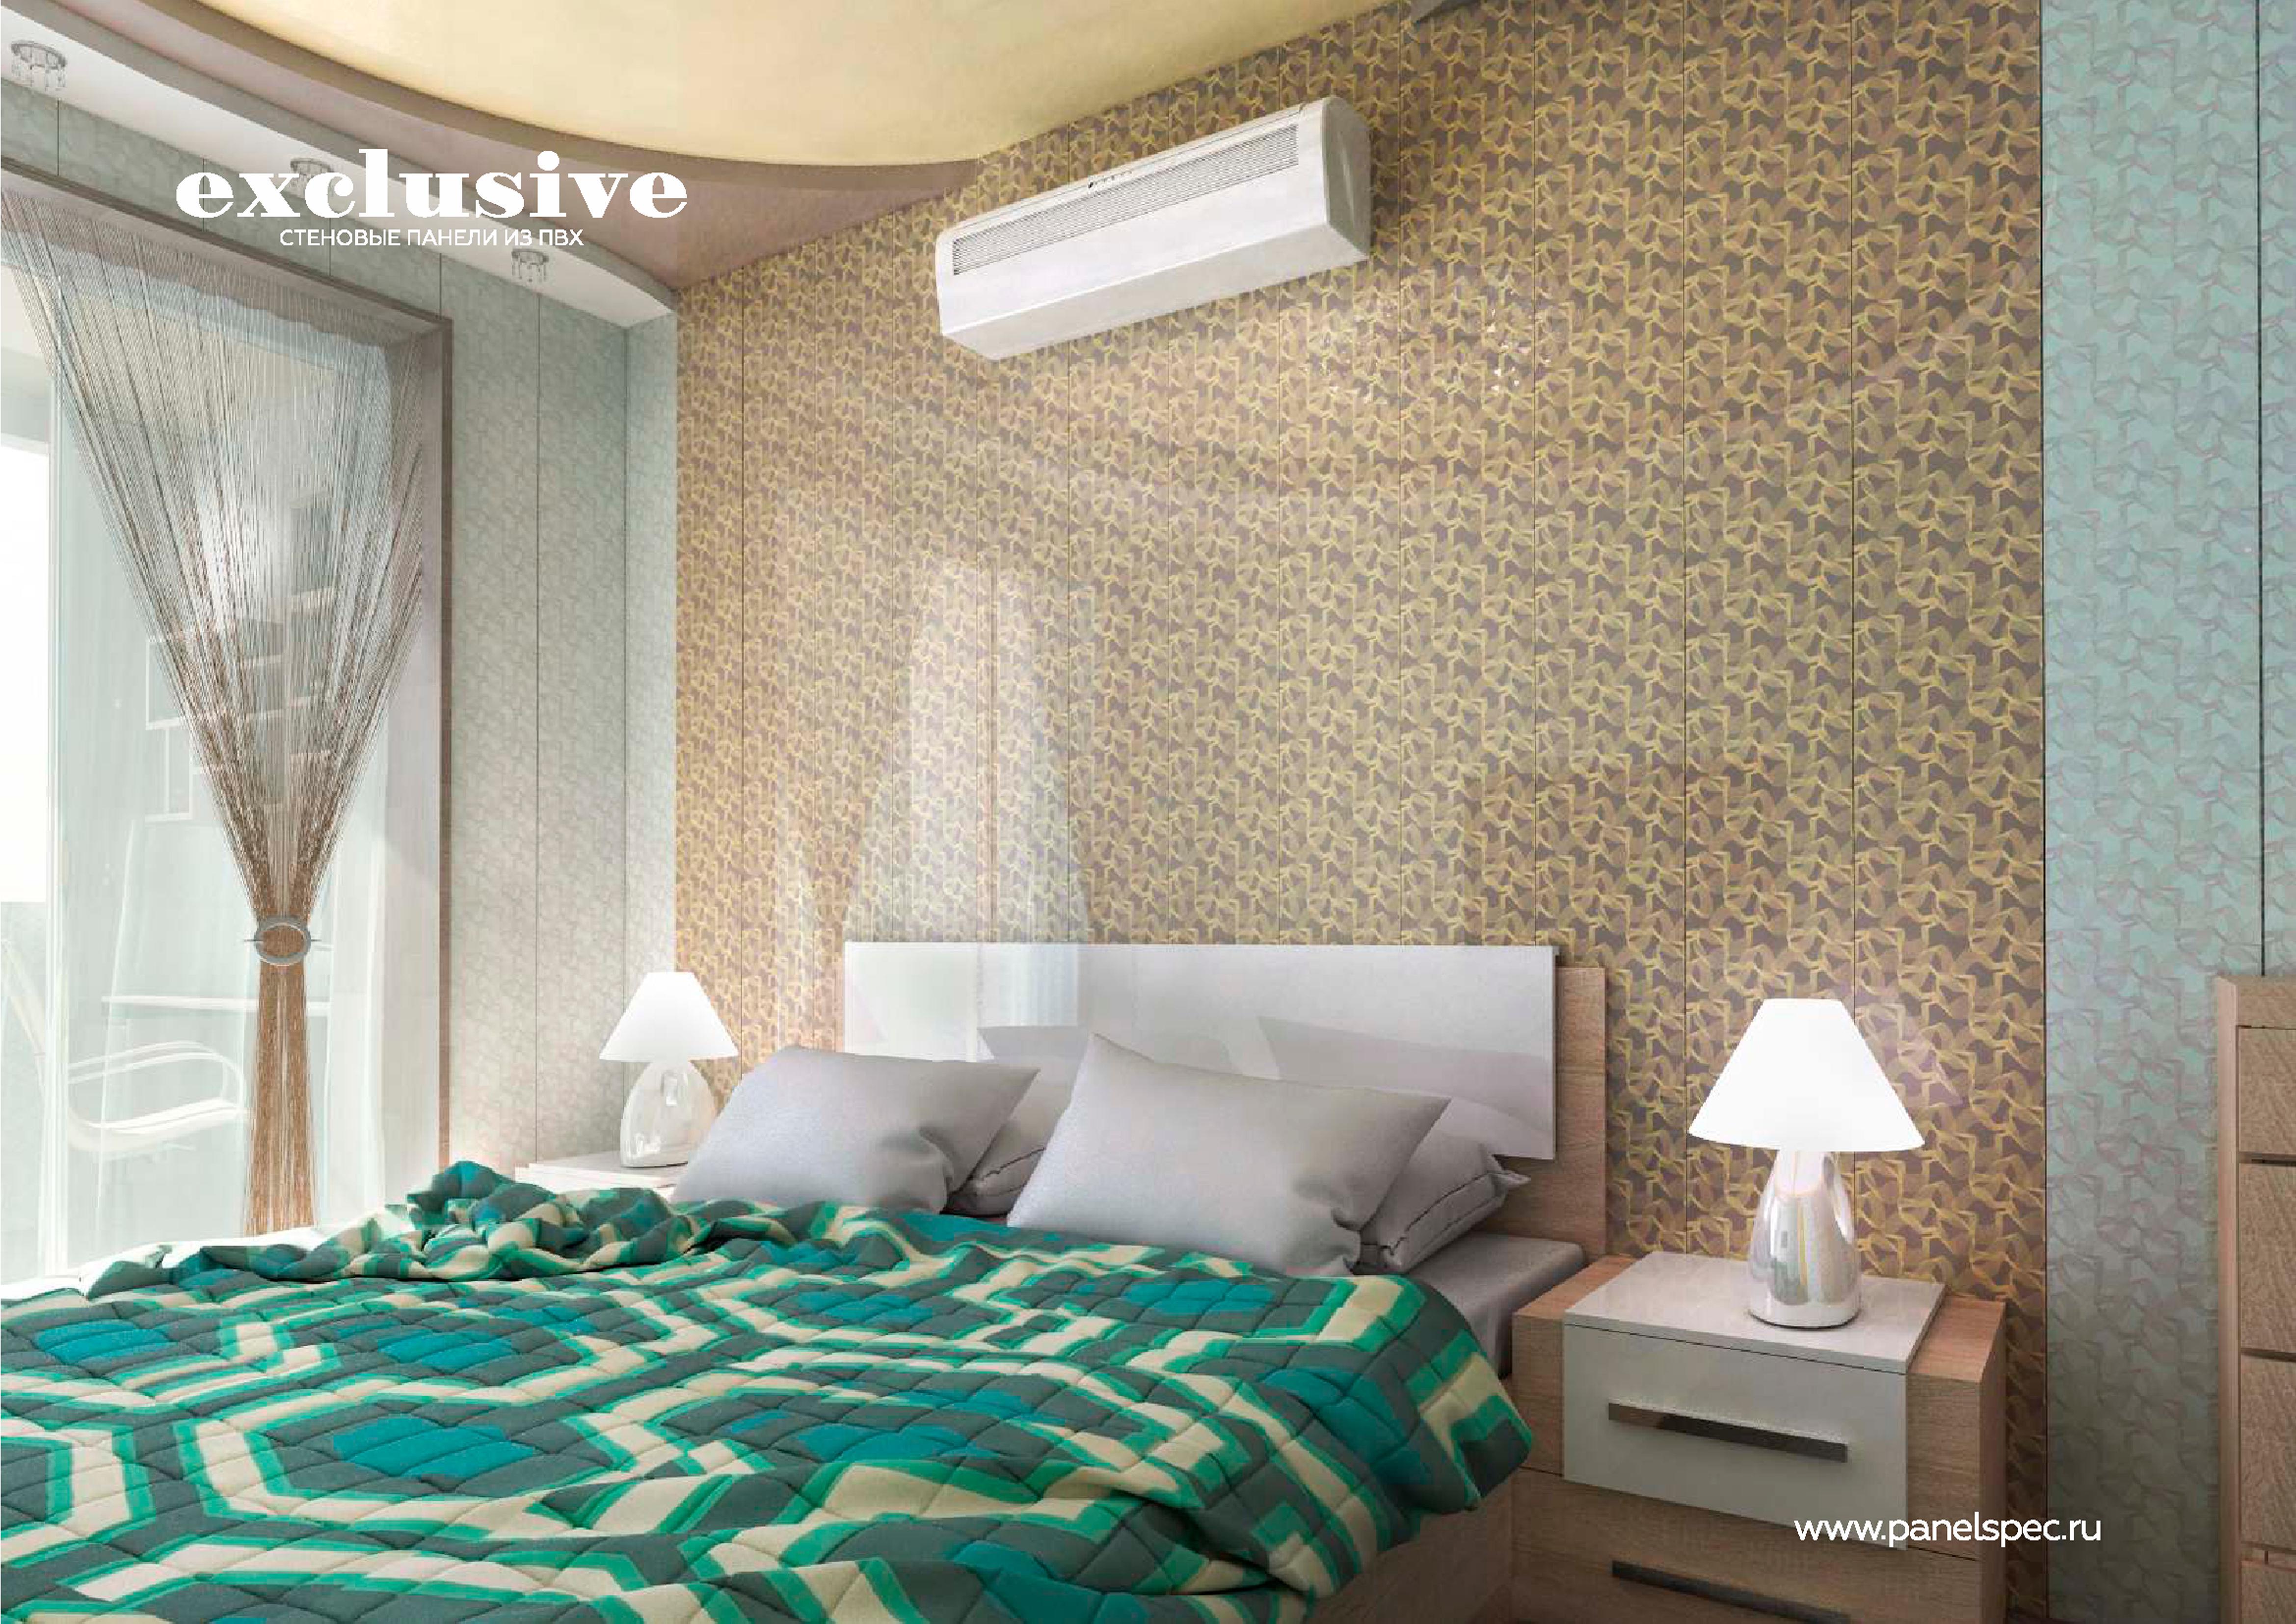 ПВХ панели для спальни| Каталог